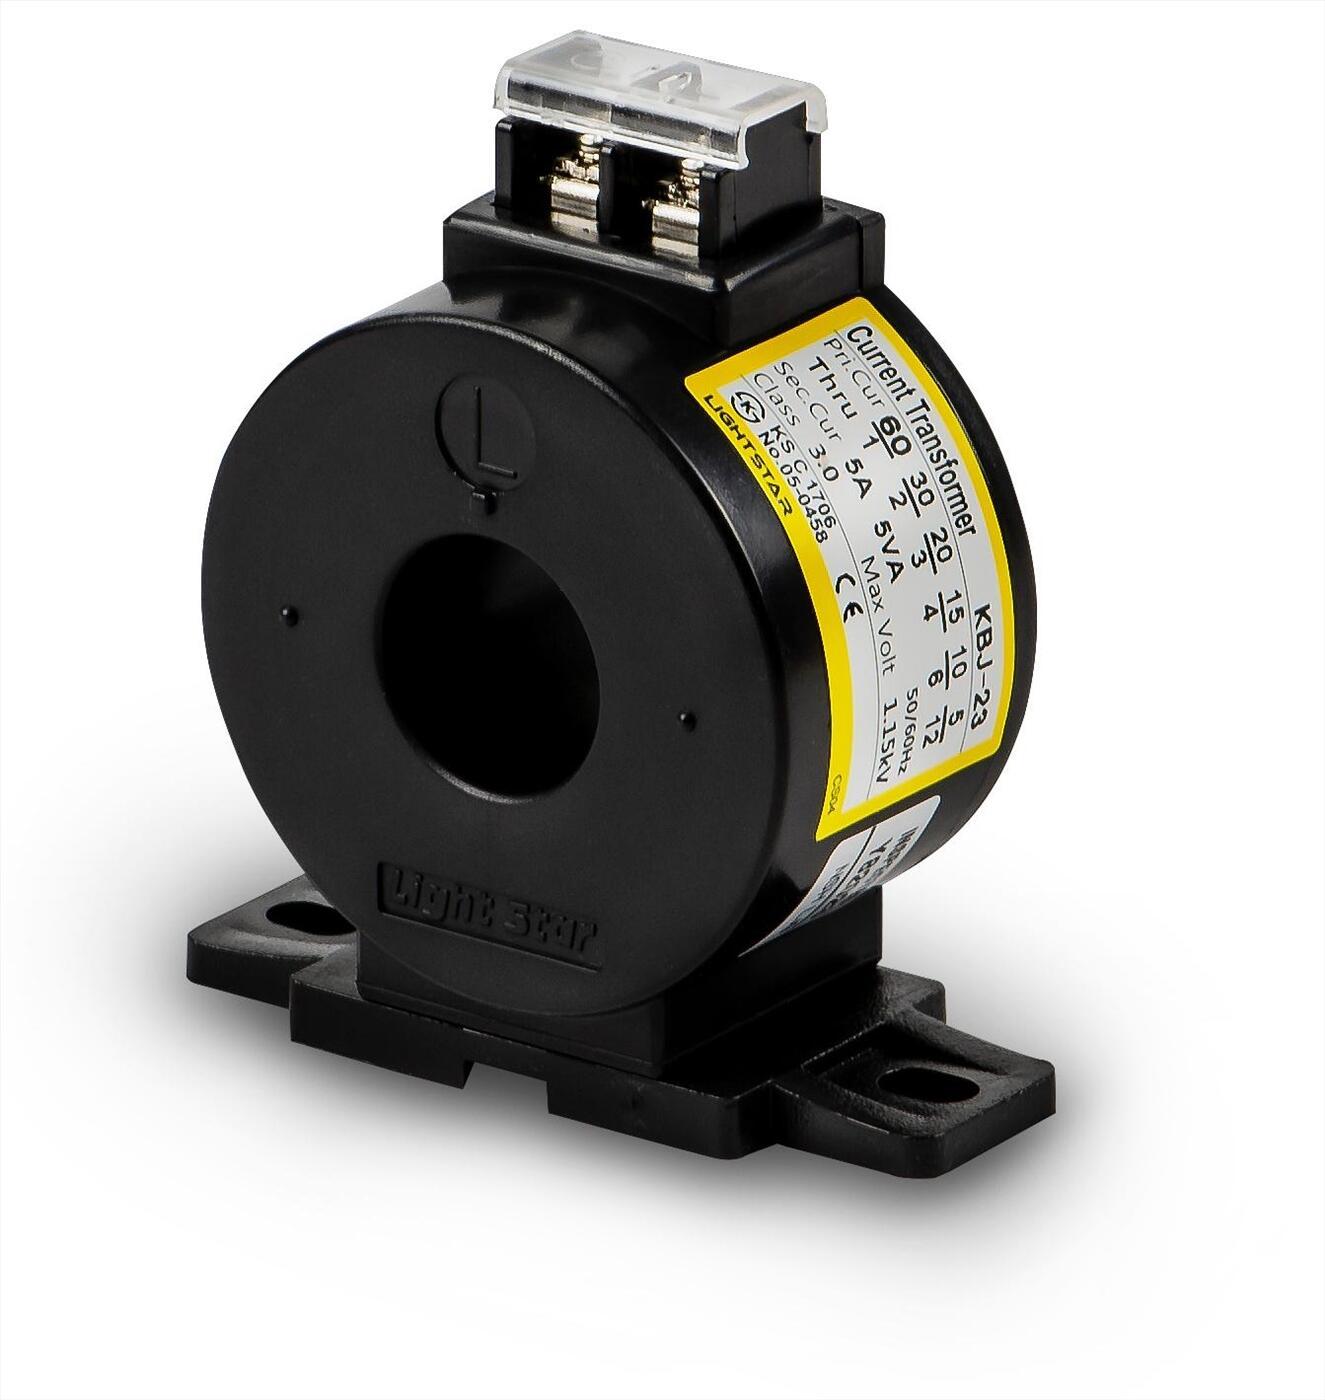 Biến dòng đo lường KBJ-23 (75/5A,100/5A,120/5A,200/5A,250/5A,300/5A)